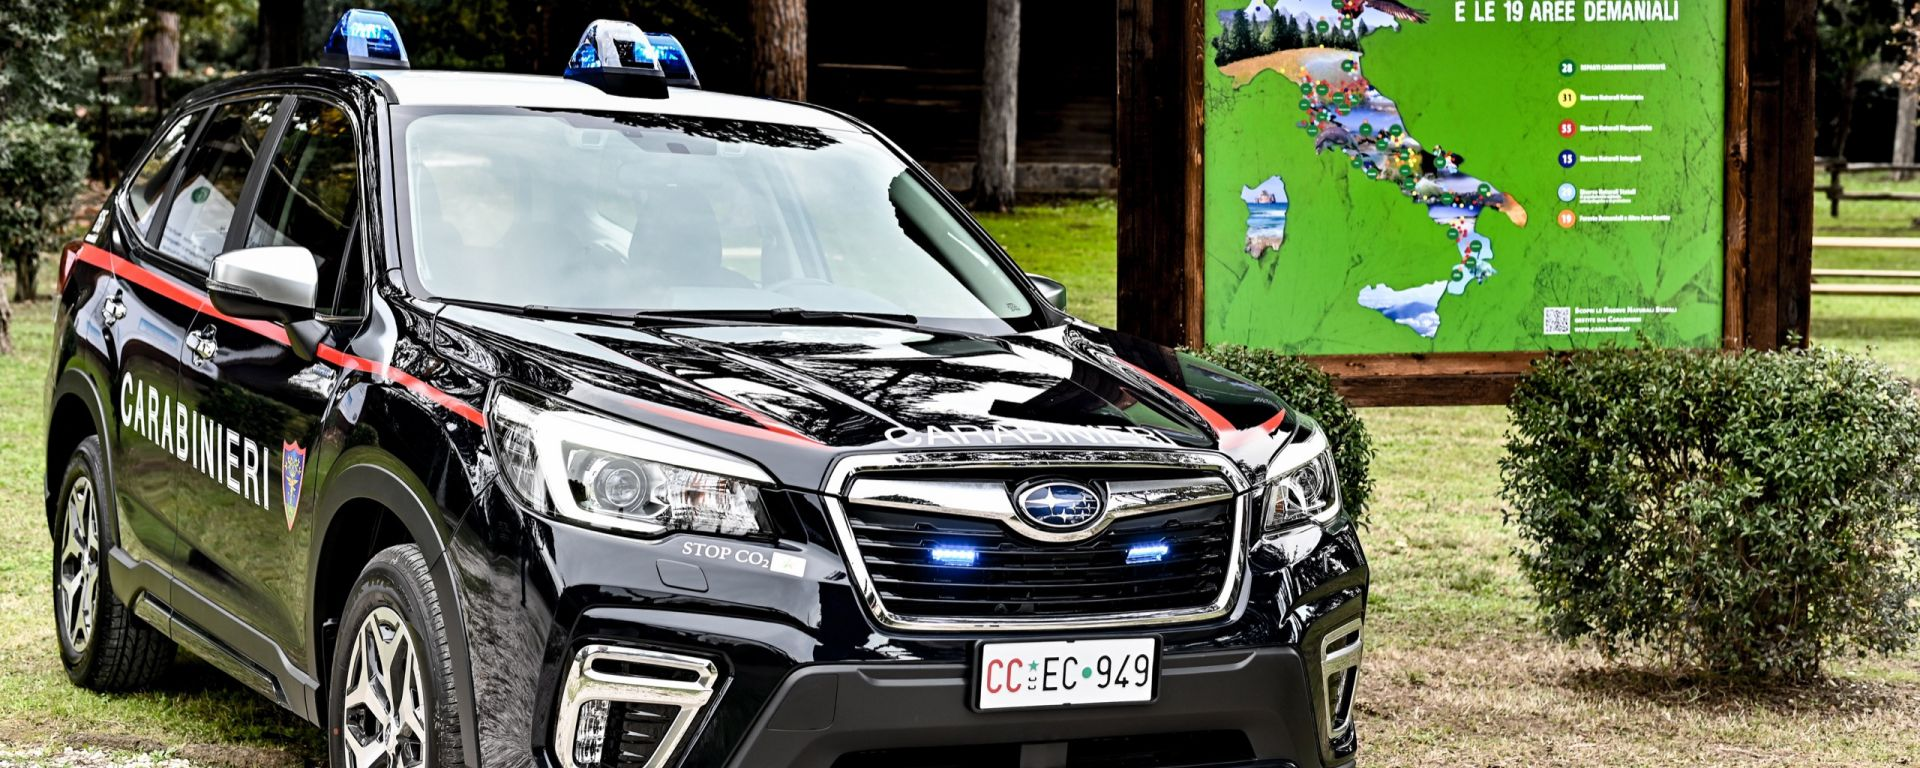 Nissan Leaf e Subaru Forester per i Carabinieri: la cerimonia a Roma